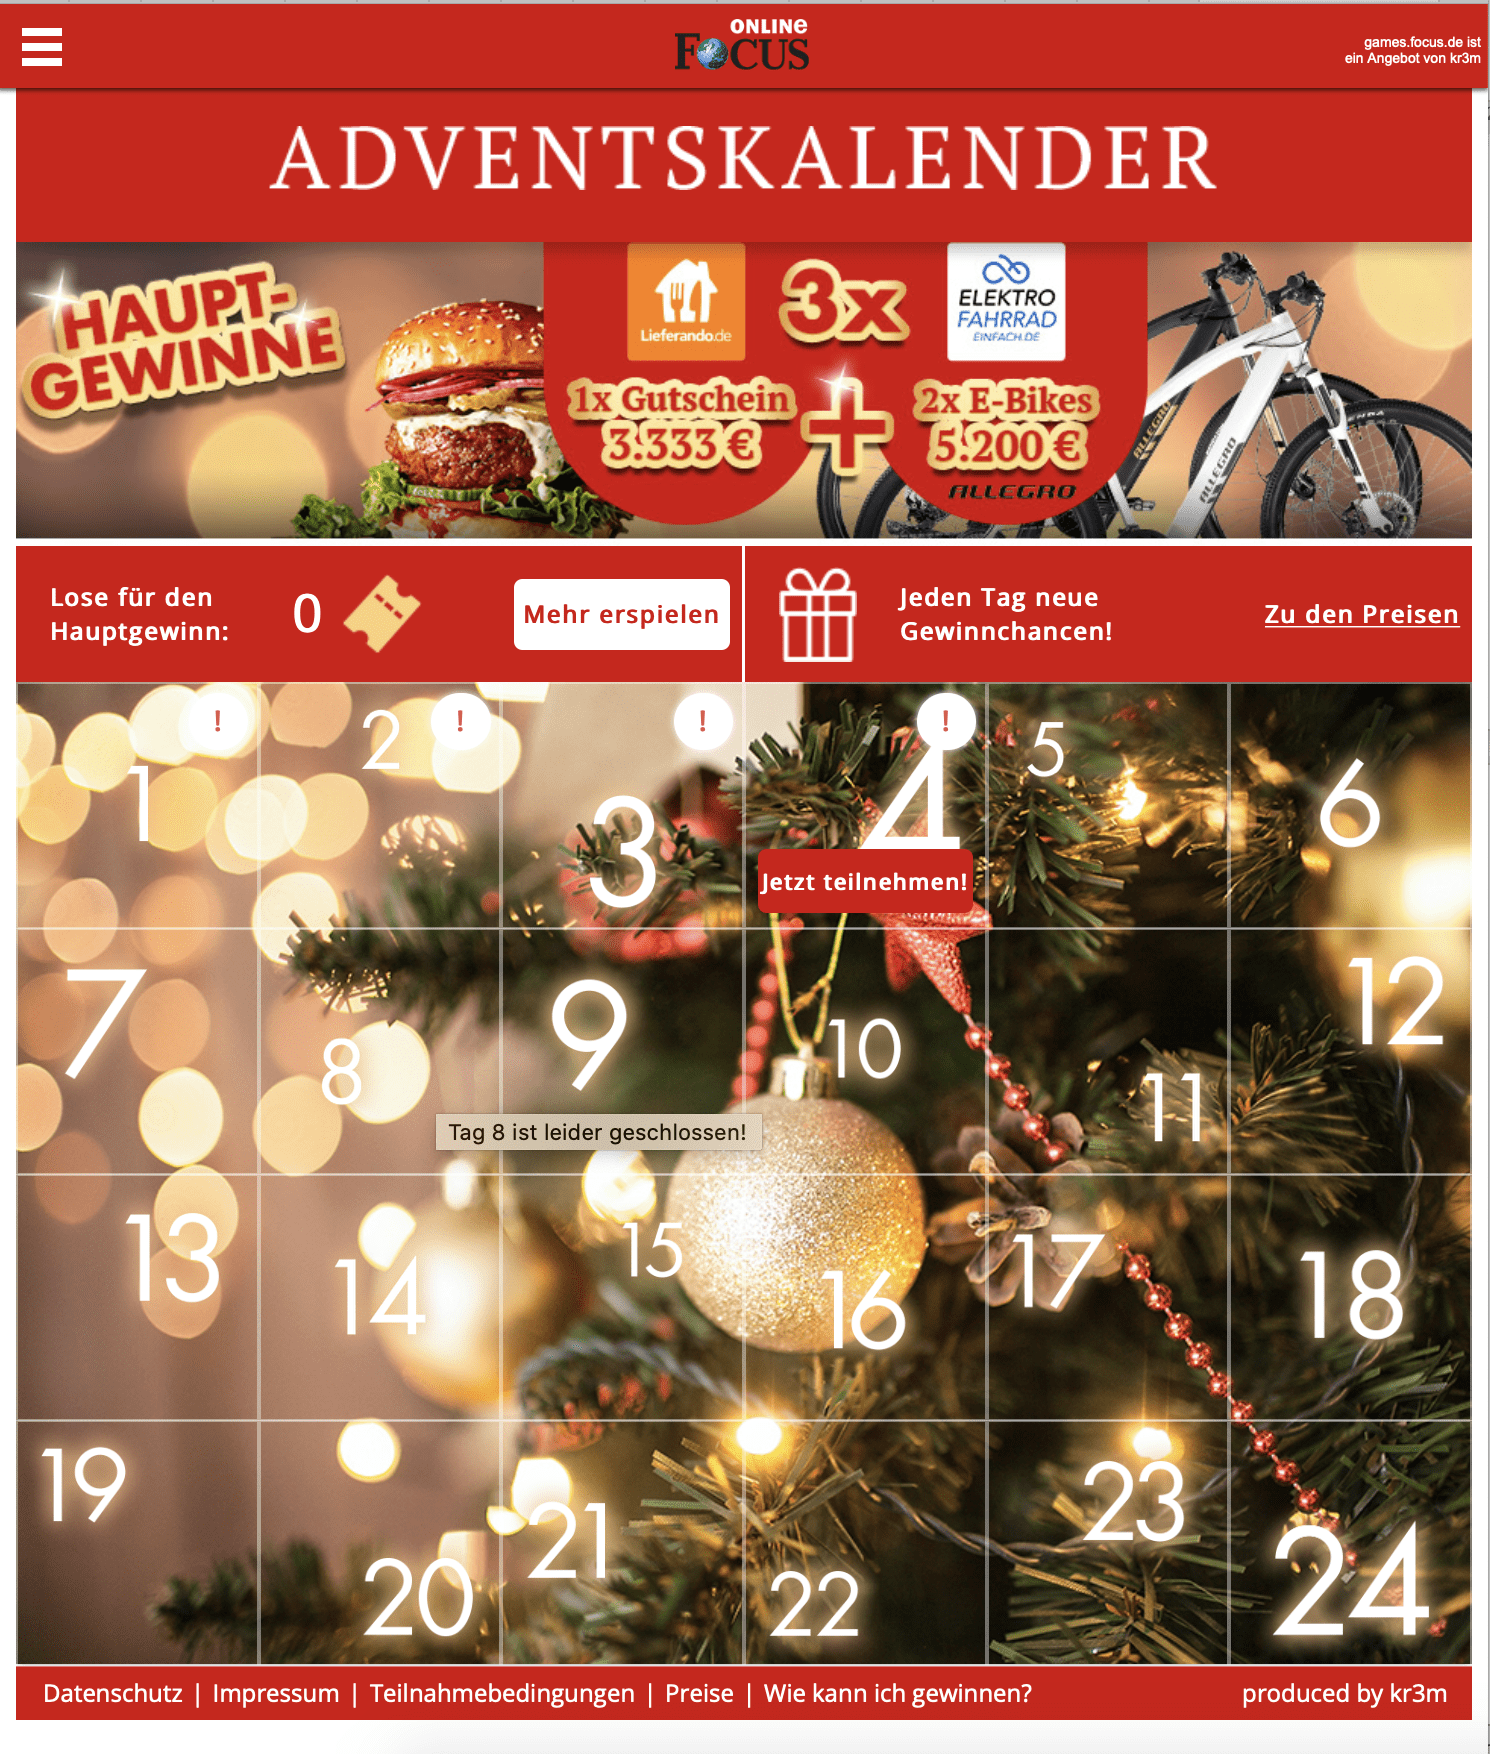 Focus Online Cases Adventskalender-Gewinnspiel